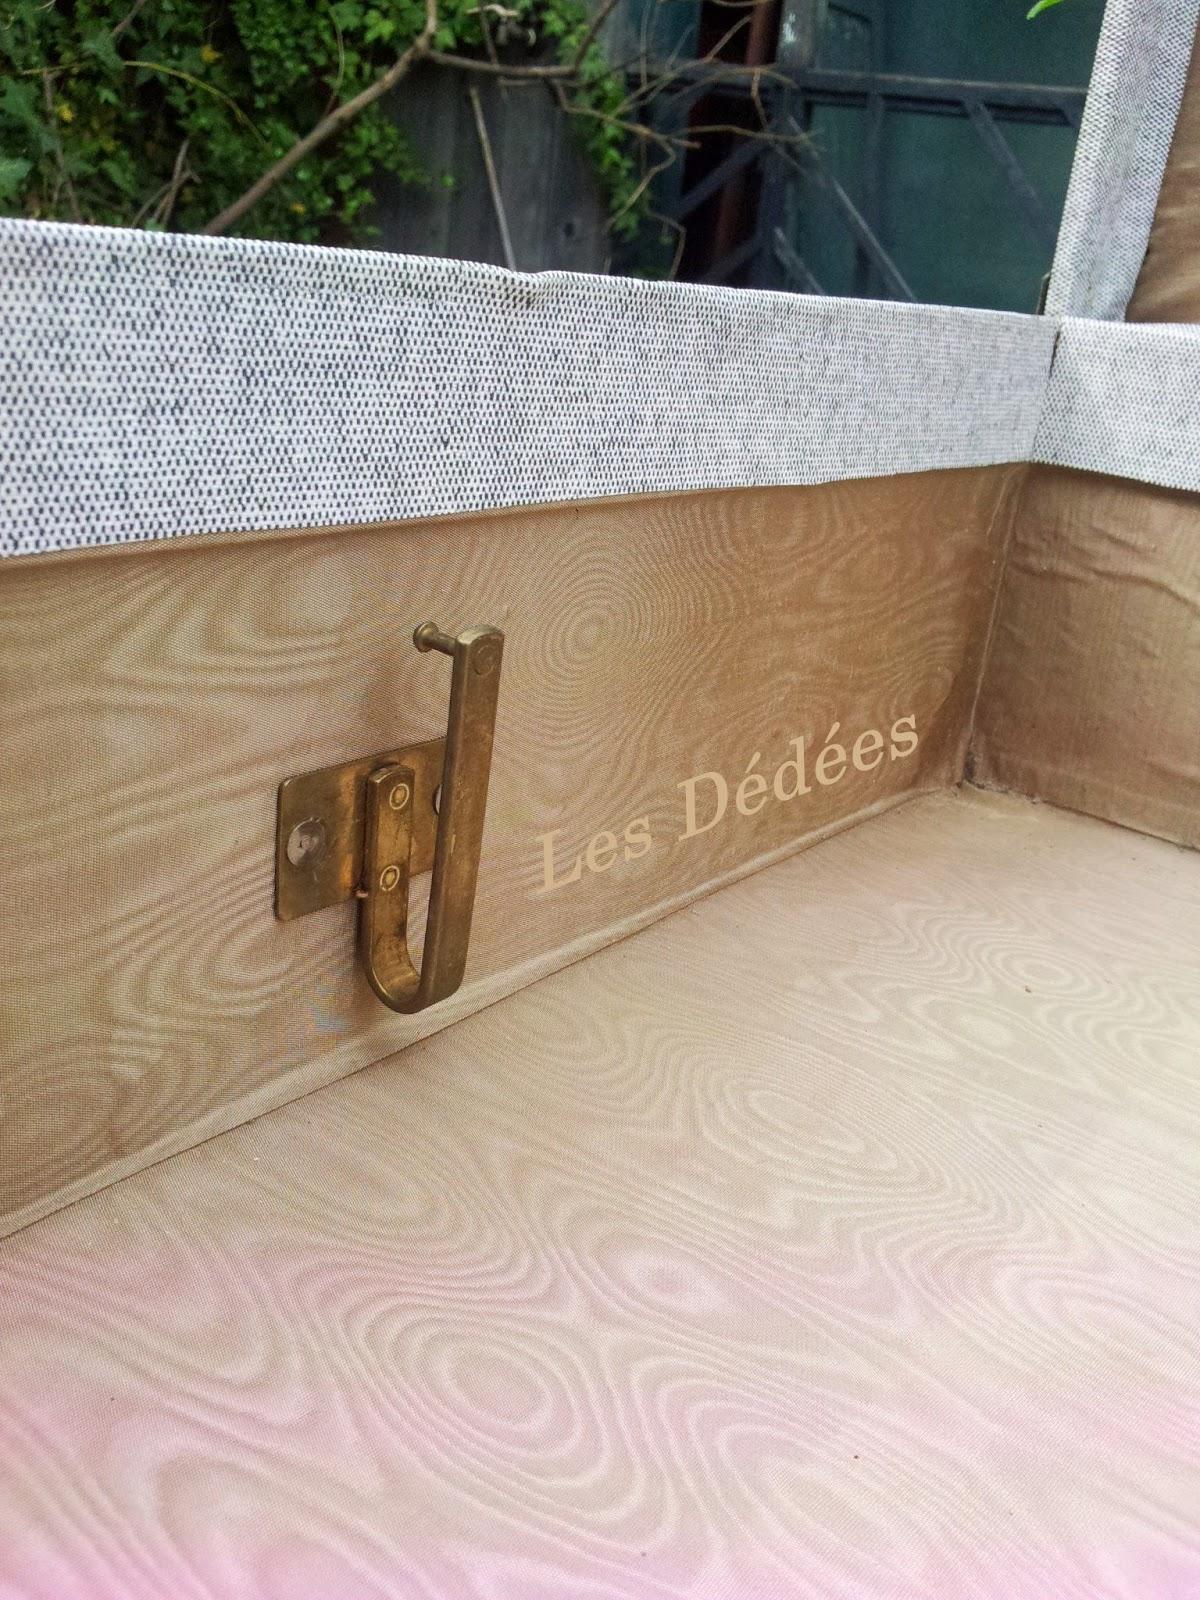 Les dedees vintage recup creations belle valise malle ancienne en tissu - Valise en bois ancienne ...